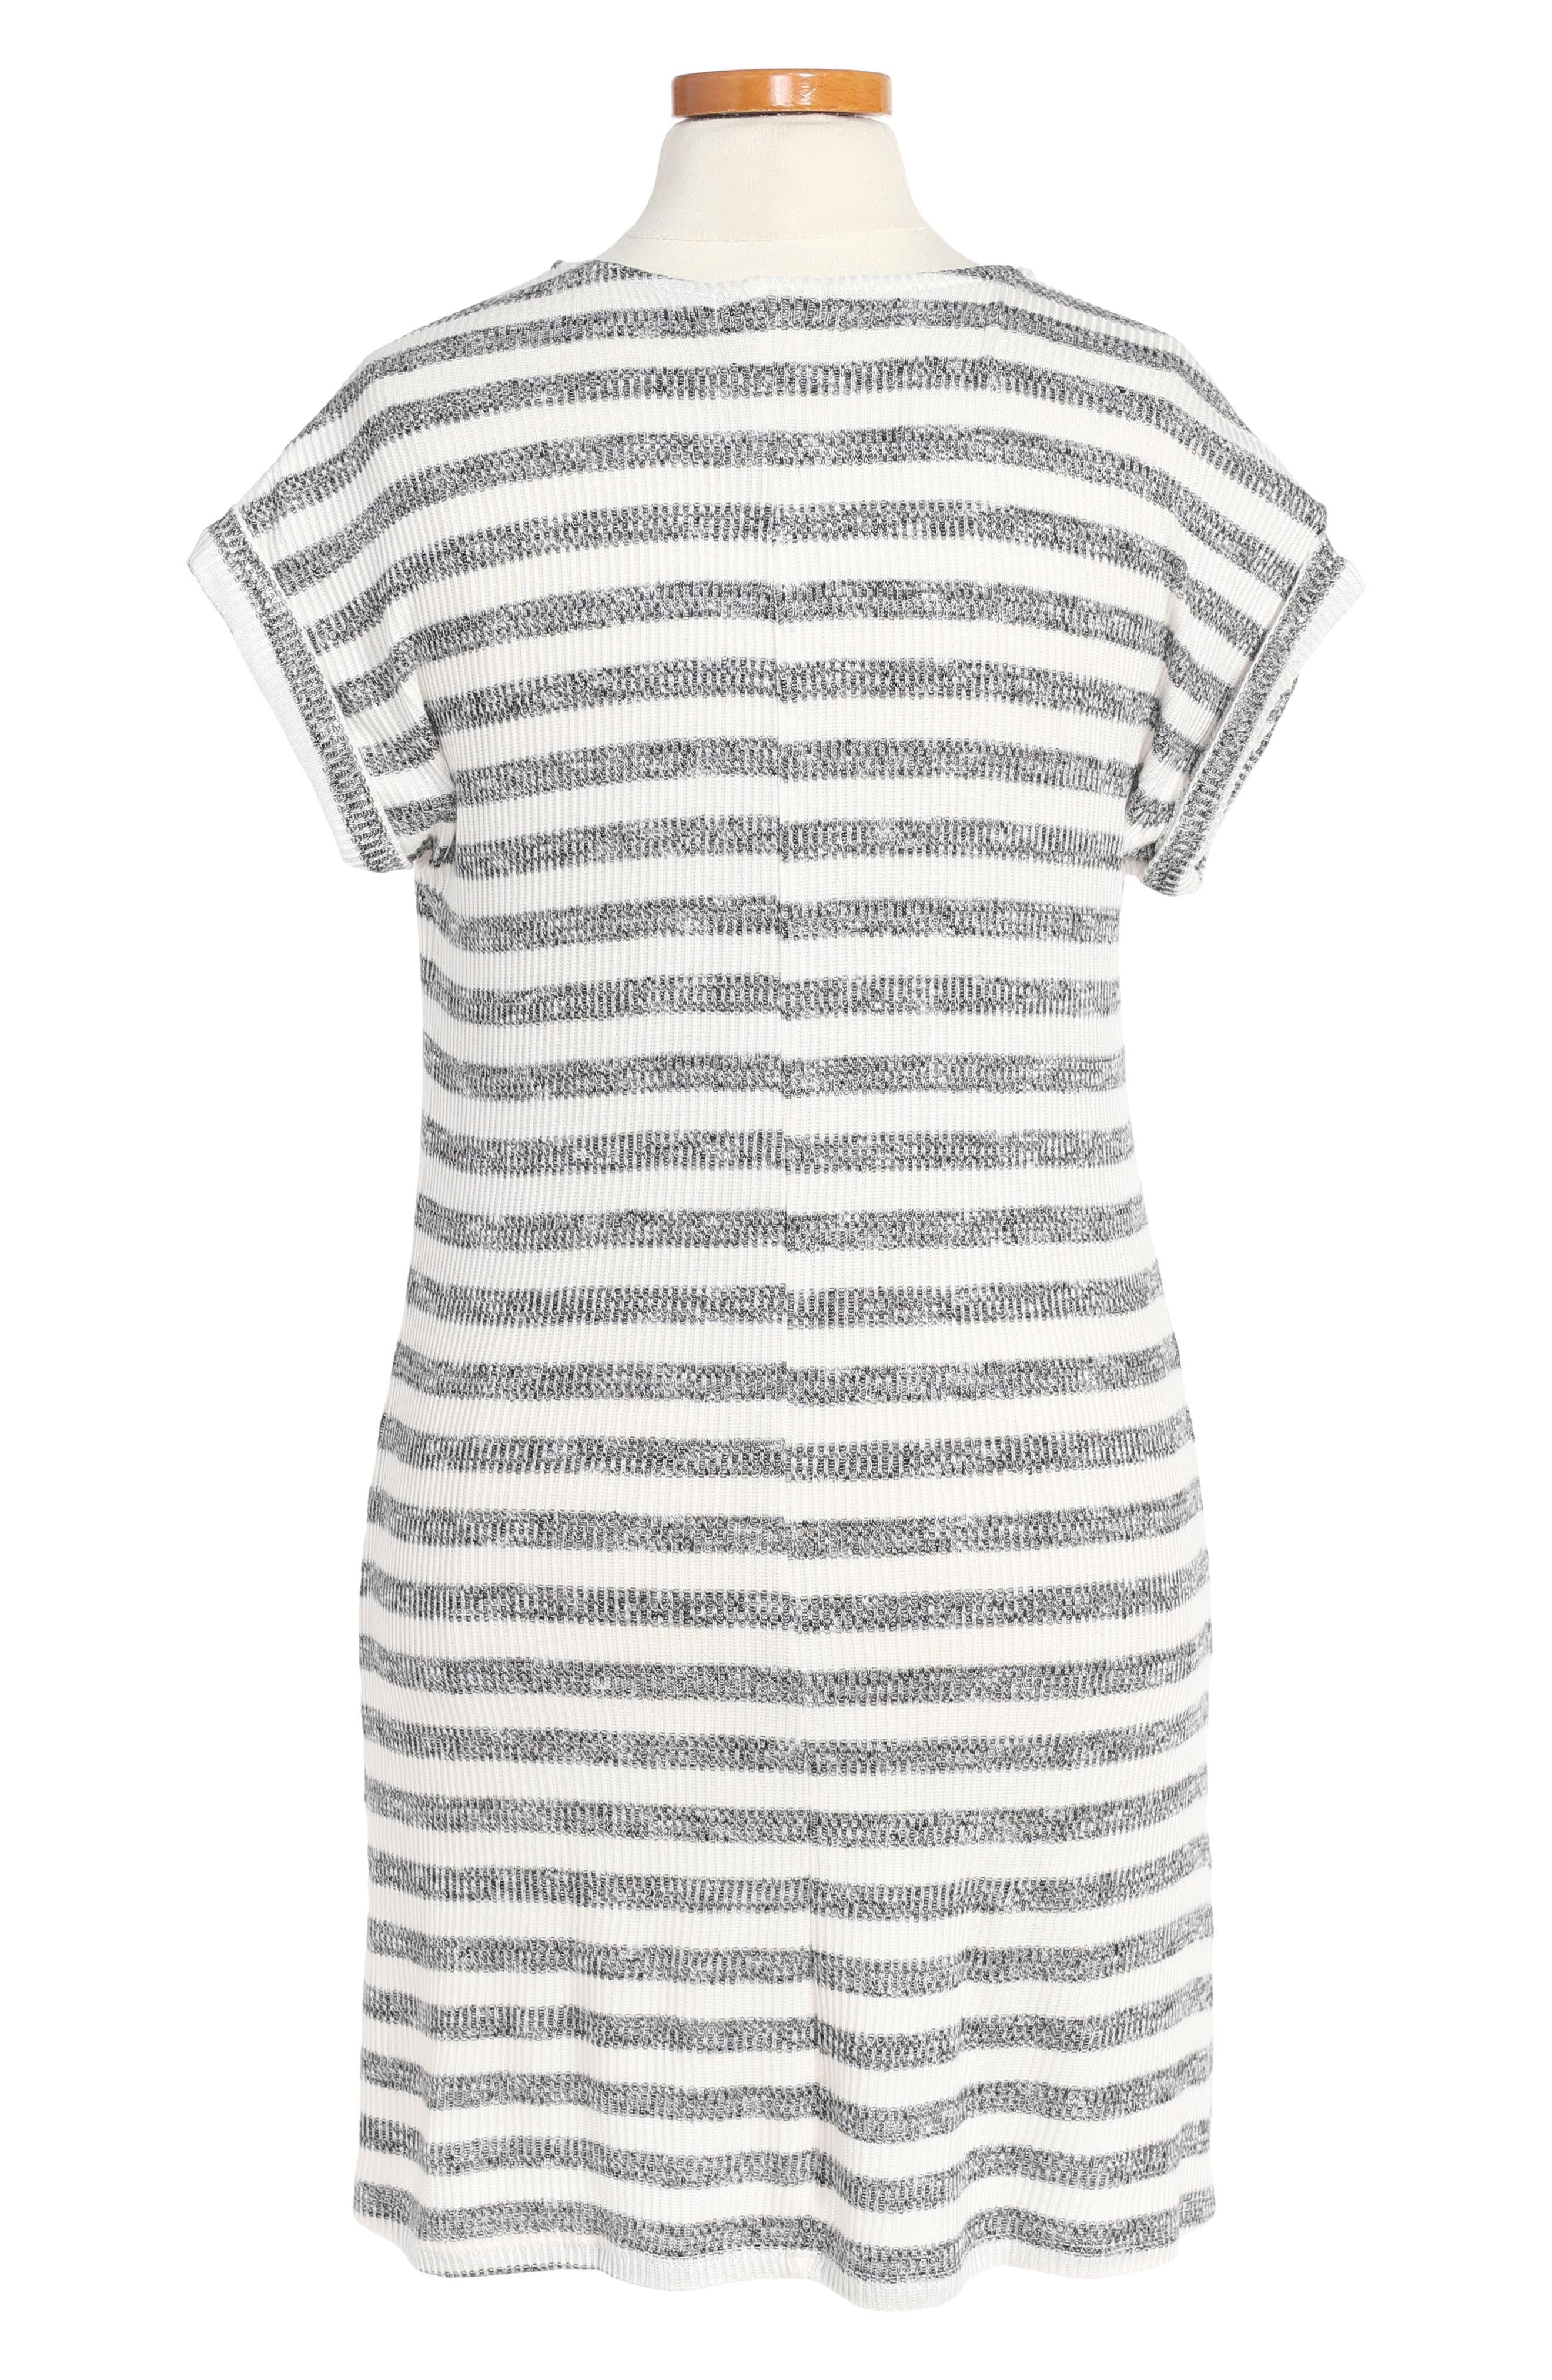 Stripe Knit Dress,                             Alternate thumbnail 2, color,                             White/ Black